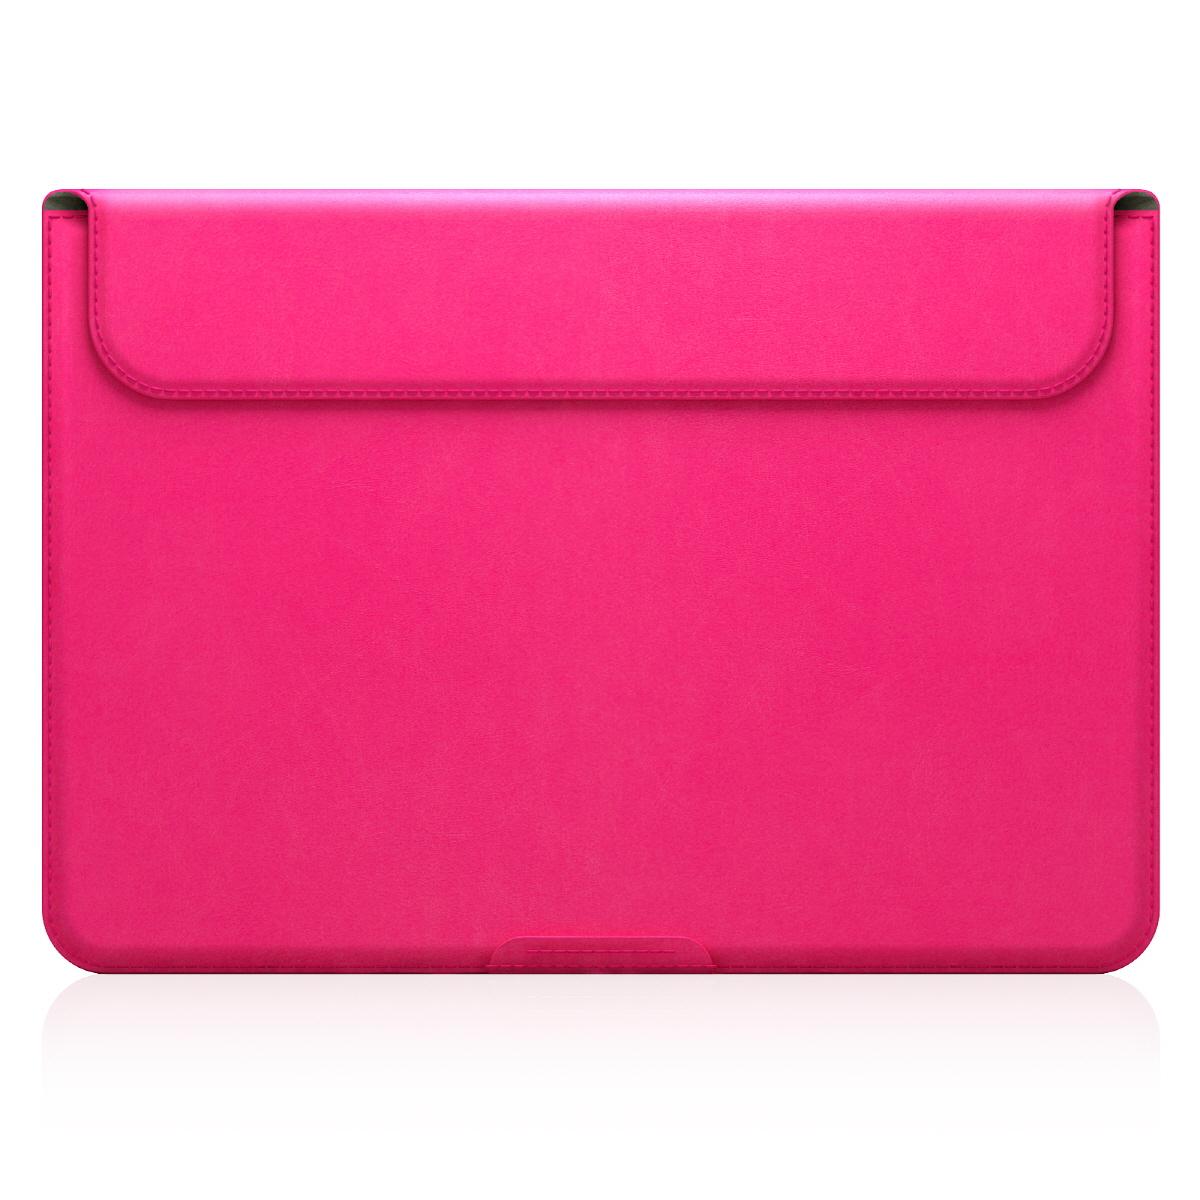 【MacBook 12インチ スタンドケース】 D5 Artificial Leather ピンク(ディーファイブ アーティフィシャルレザー)